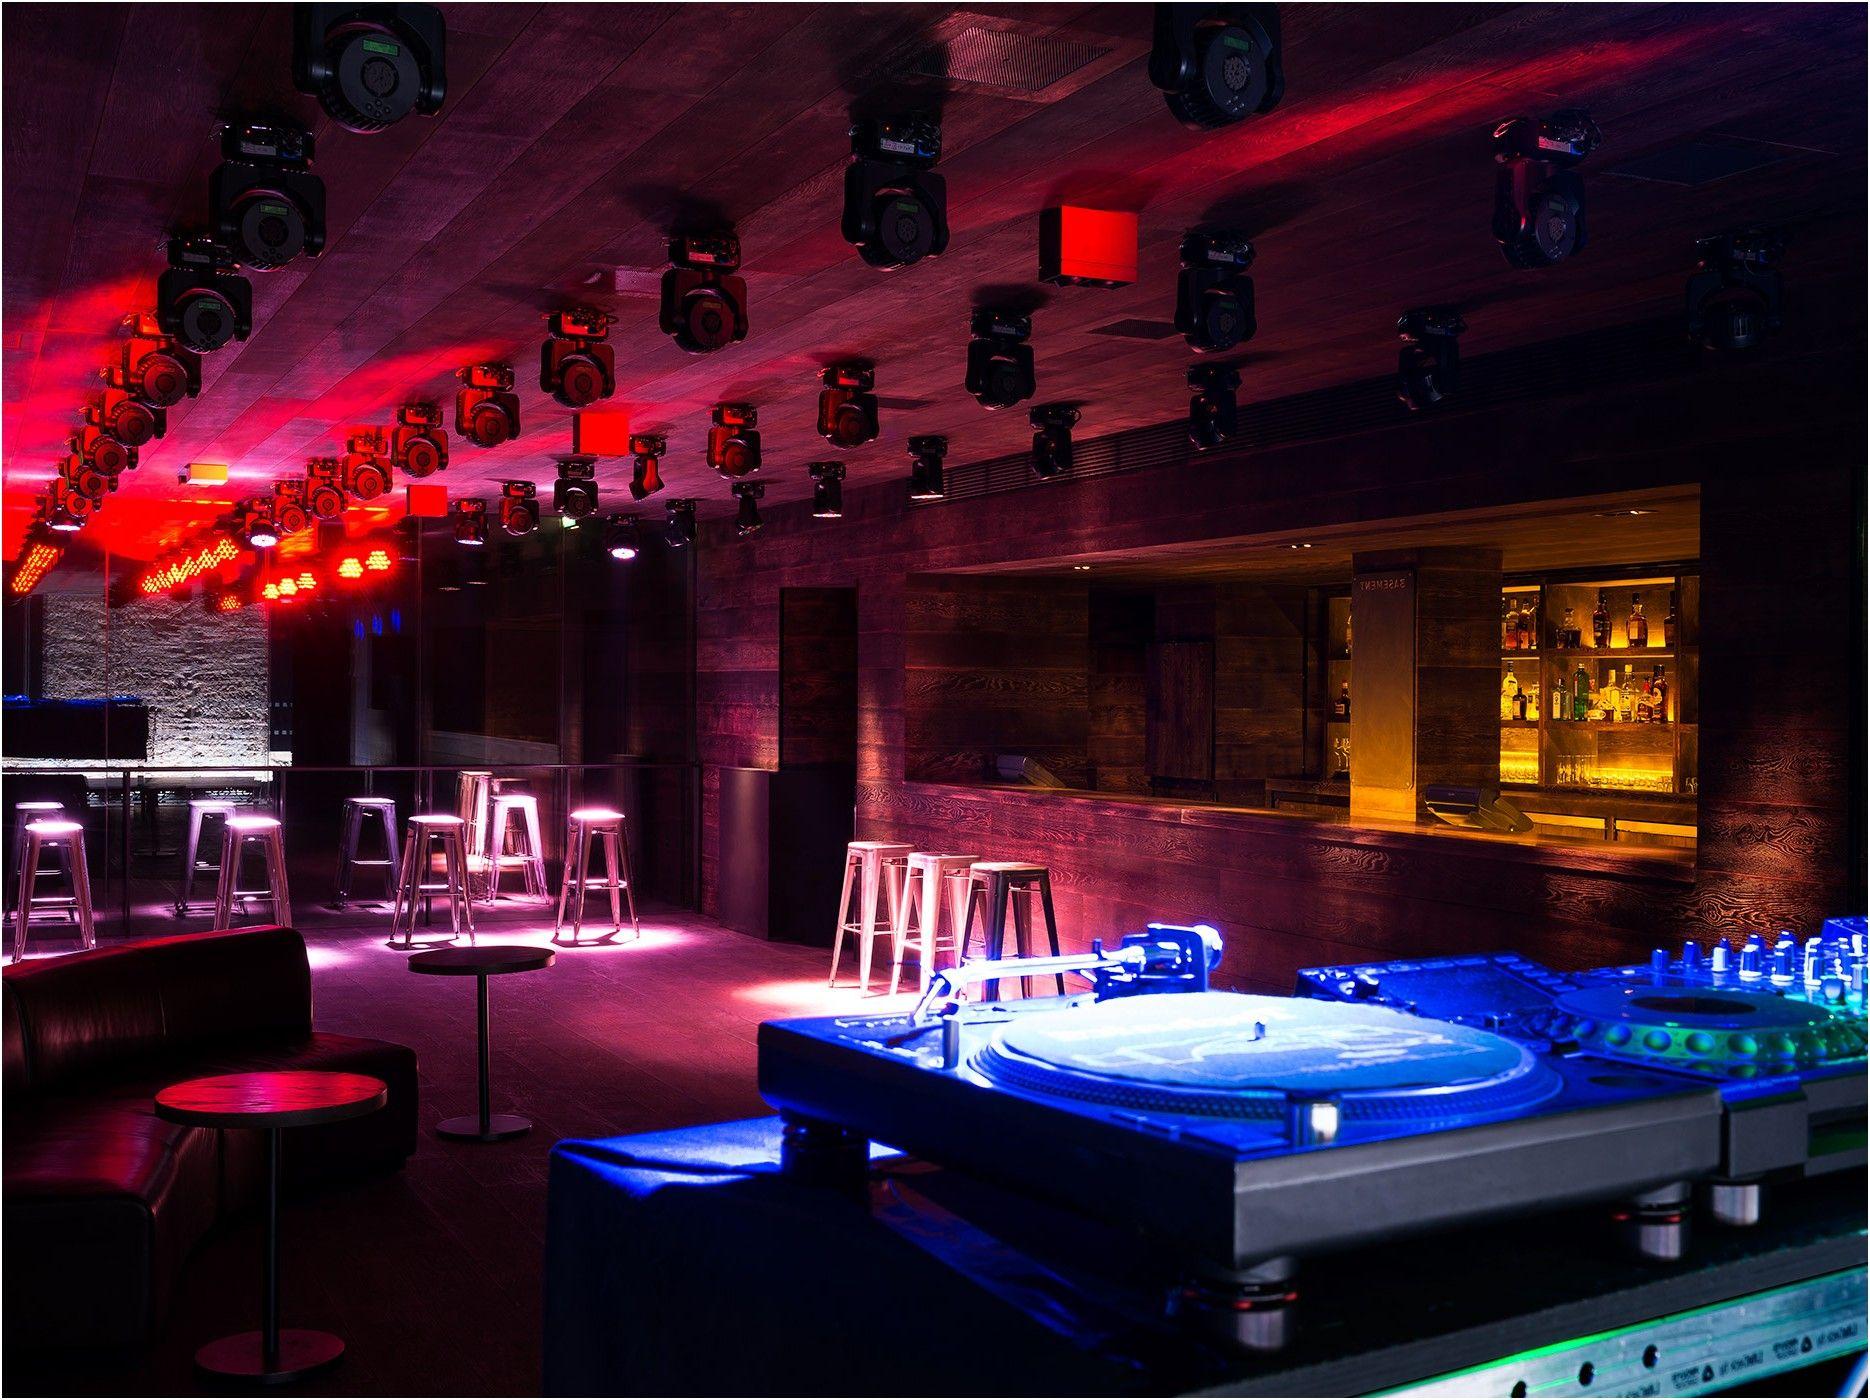 Best Of Basement Club Edition Hotel Dengan Gambar